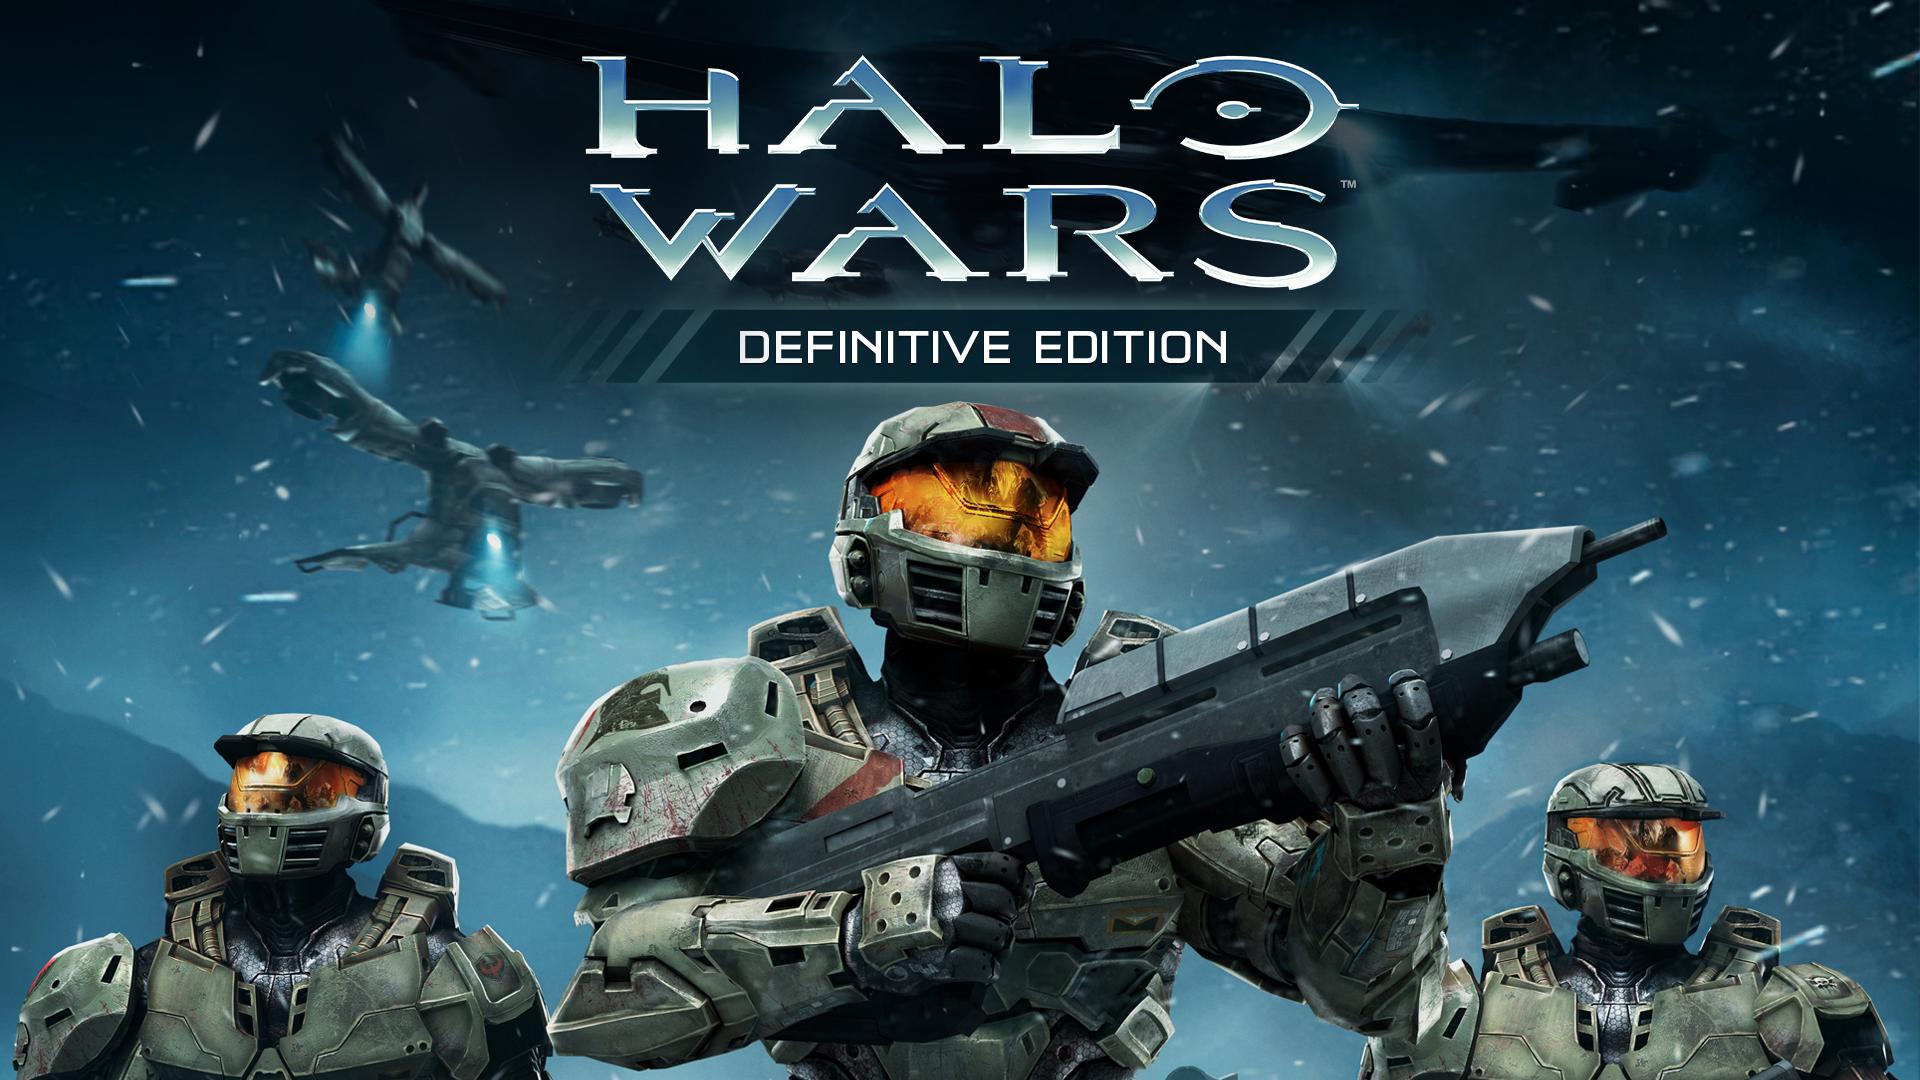 halo wars demo download mac